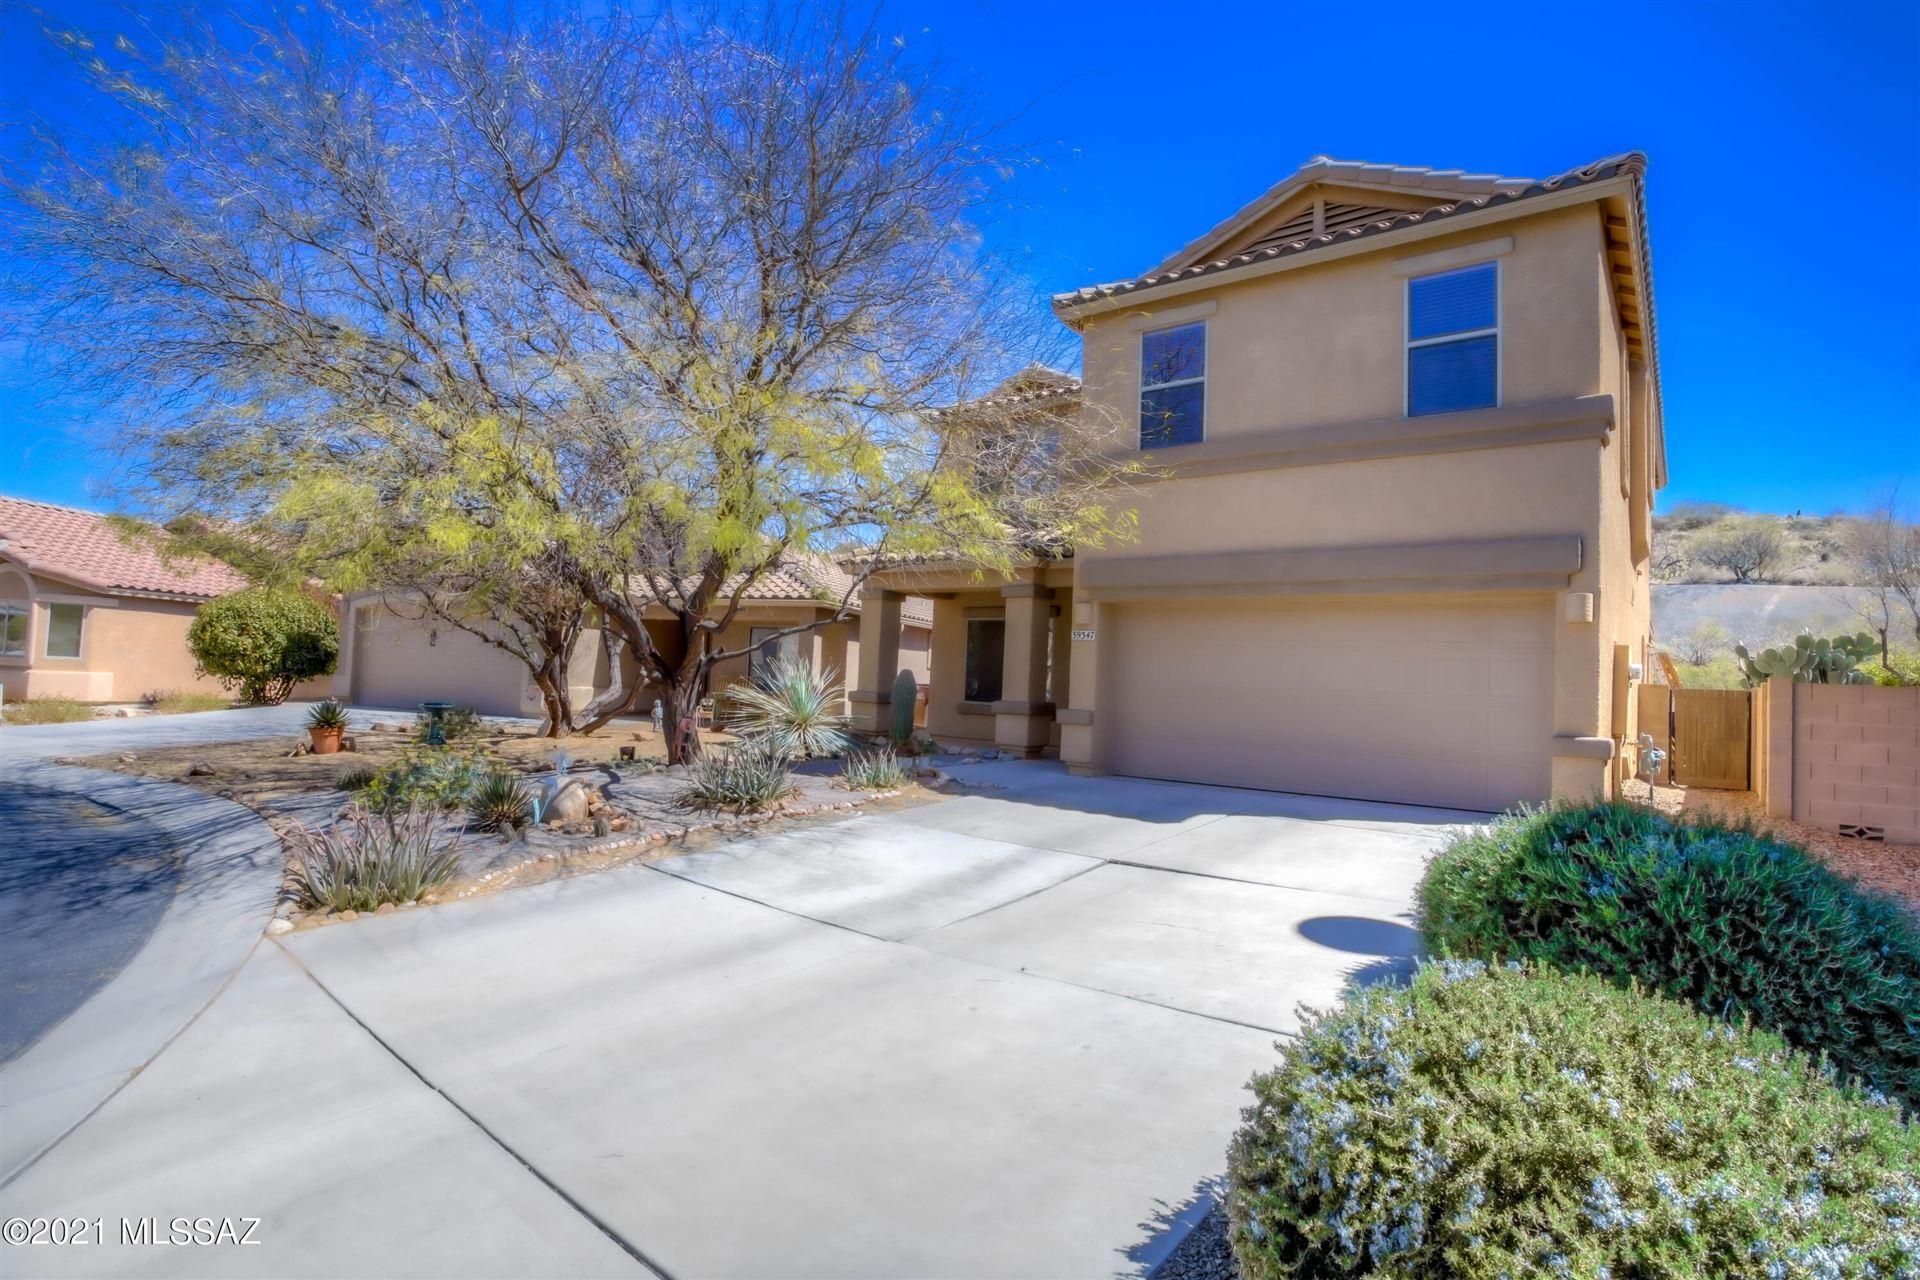 39347 S Old Arena Drive, Tucson, AZ 85739 - MLS#: 22107968